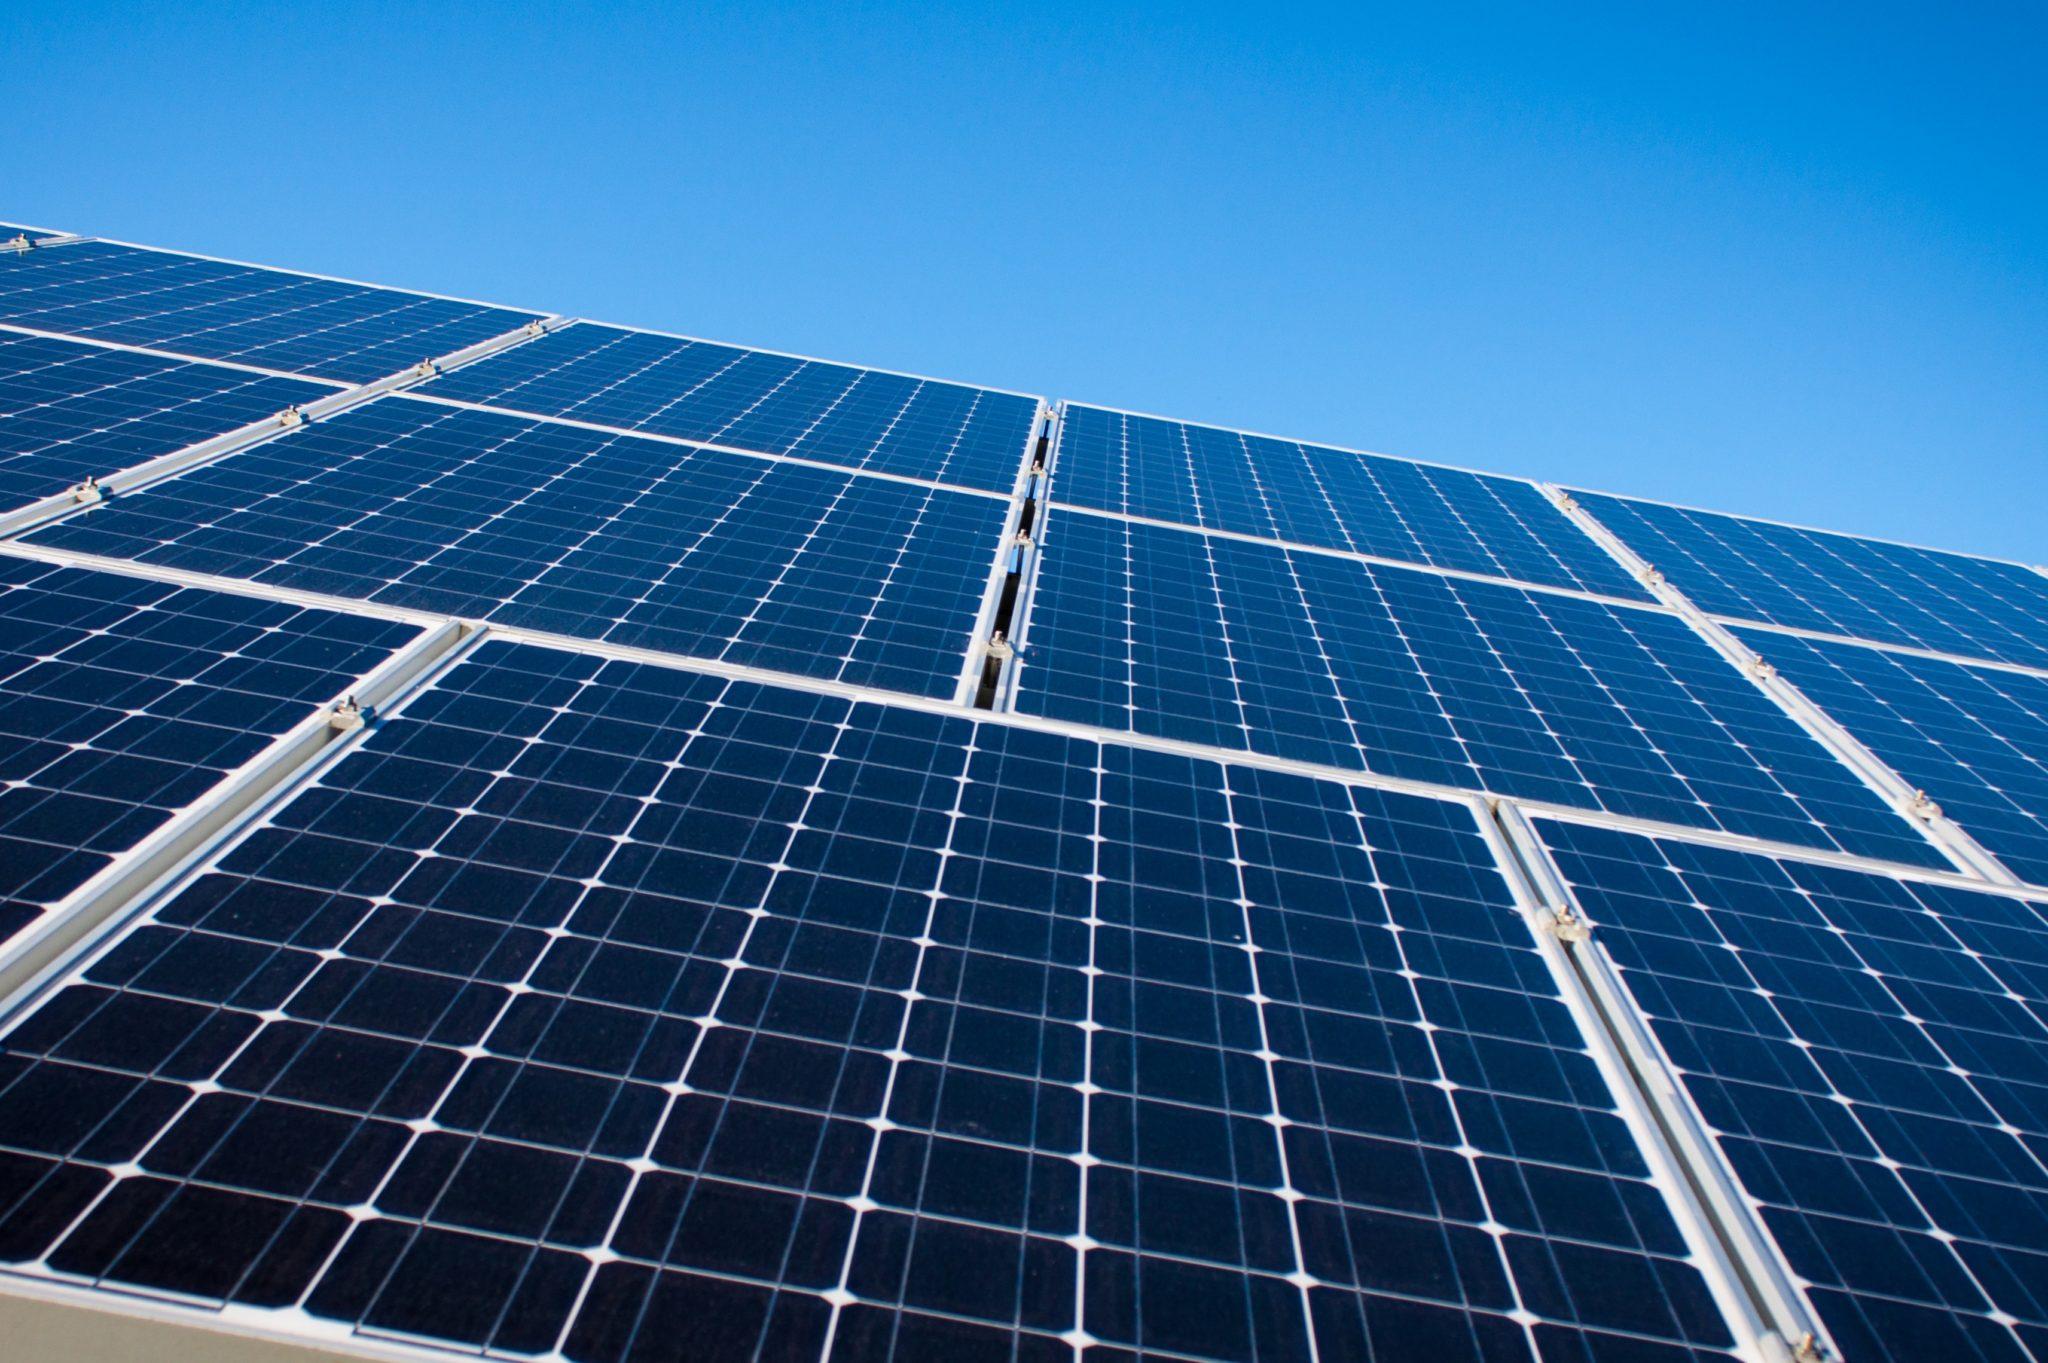 Energia Solare In Sicilia come funziona l'energia fotovoltaica - 3ee next energy